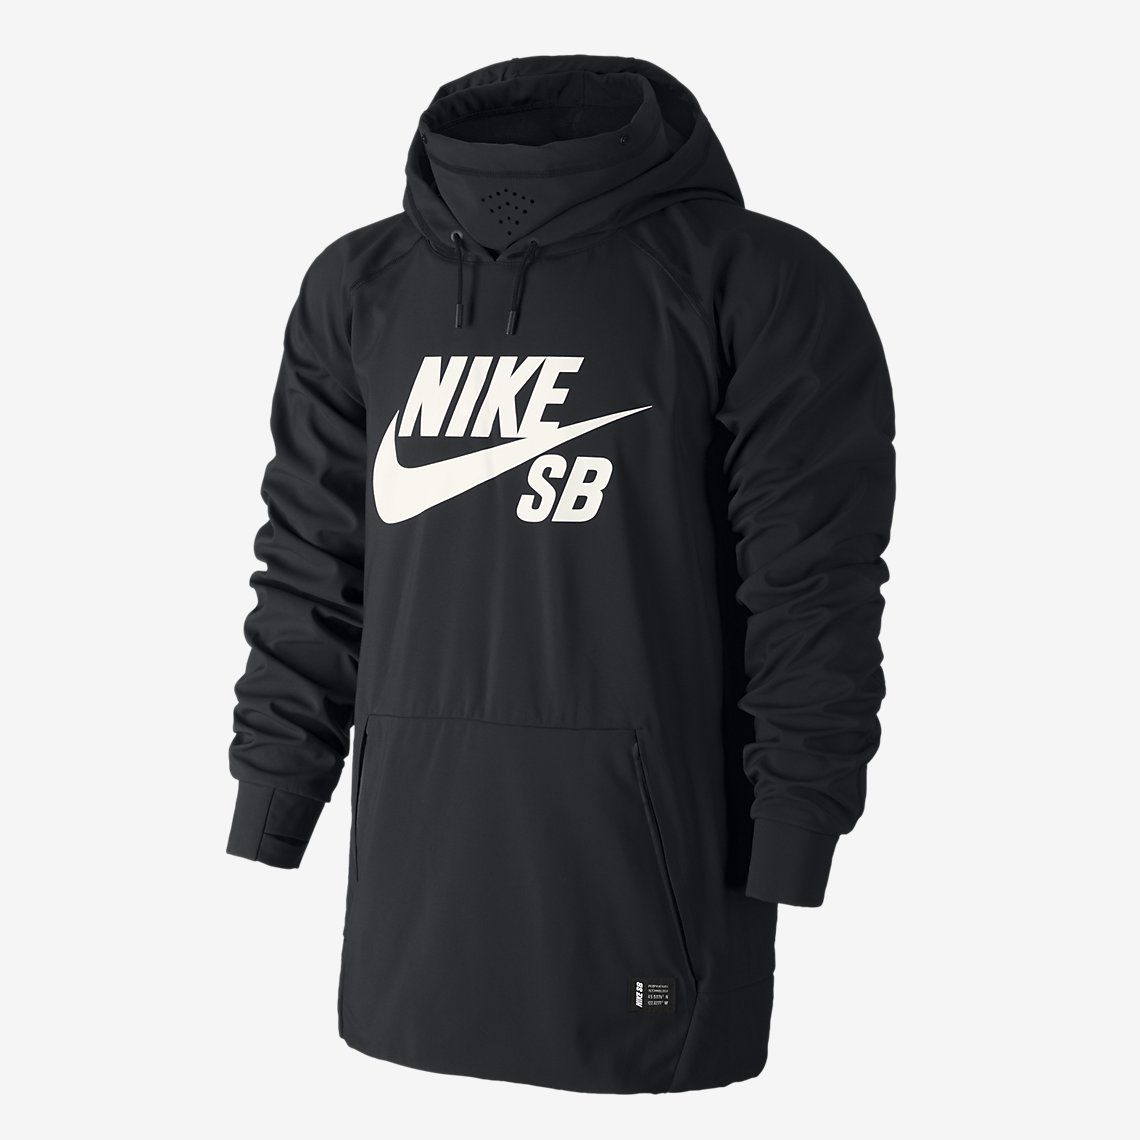 7a37746efc Taille : XL Nike SB Enigma – Sweat à capuche pour Homme. Nike Store ...